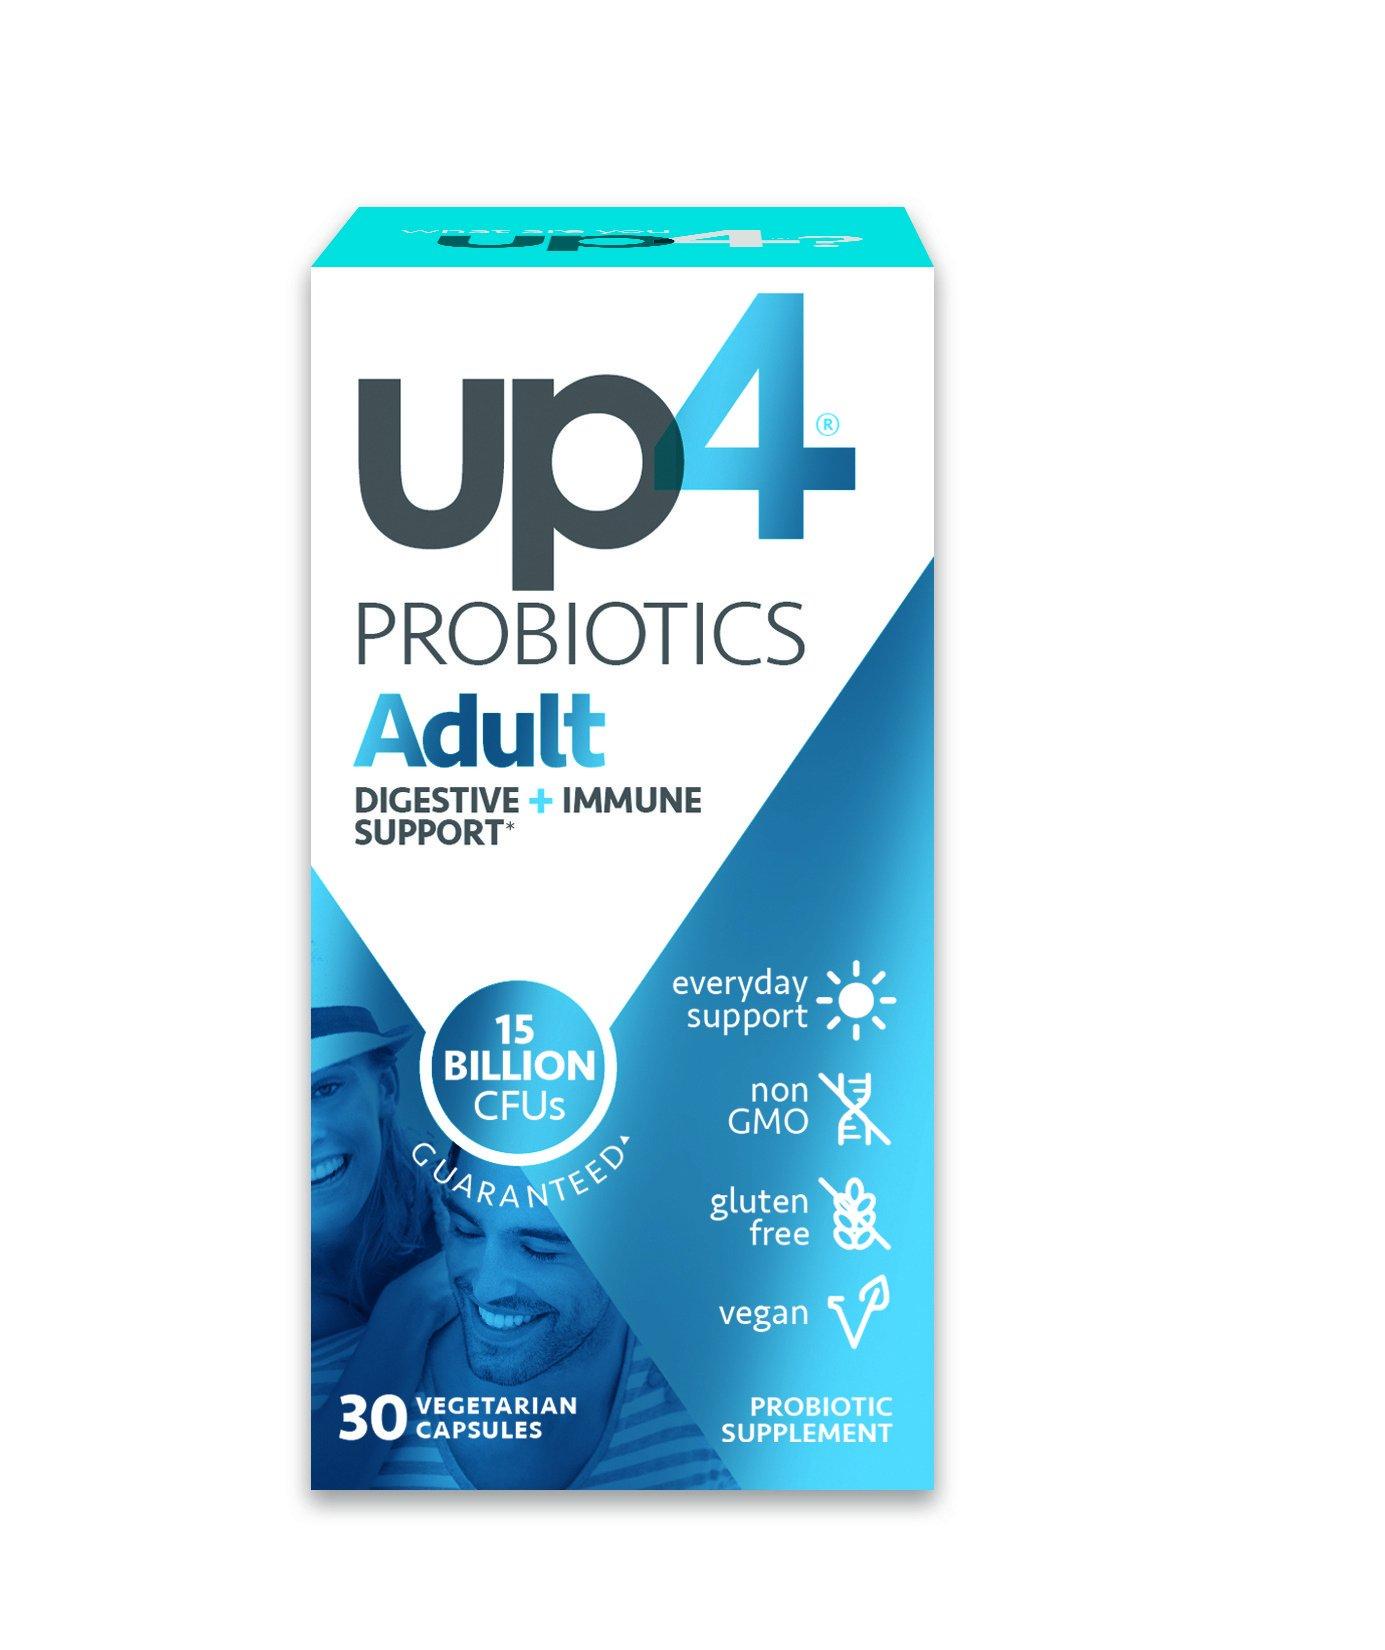 up4 Adult Probiotic Supplement | Digestive + Immune Support | 15 Billion CFU Guaranteed | Everyday Support | Non-GMO, Gluten Free, Vegan | 30 Vegetarian Capsules